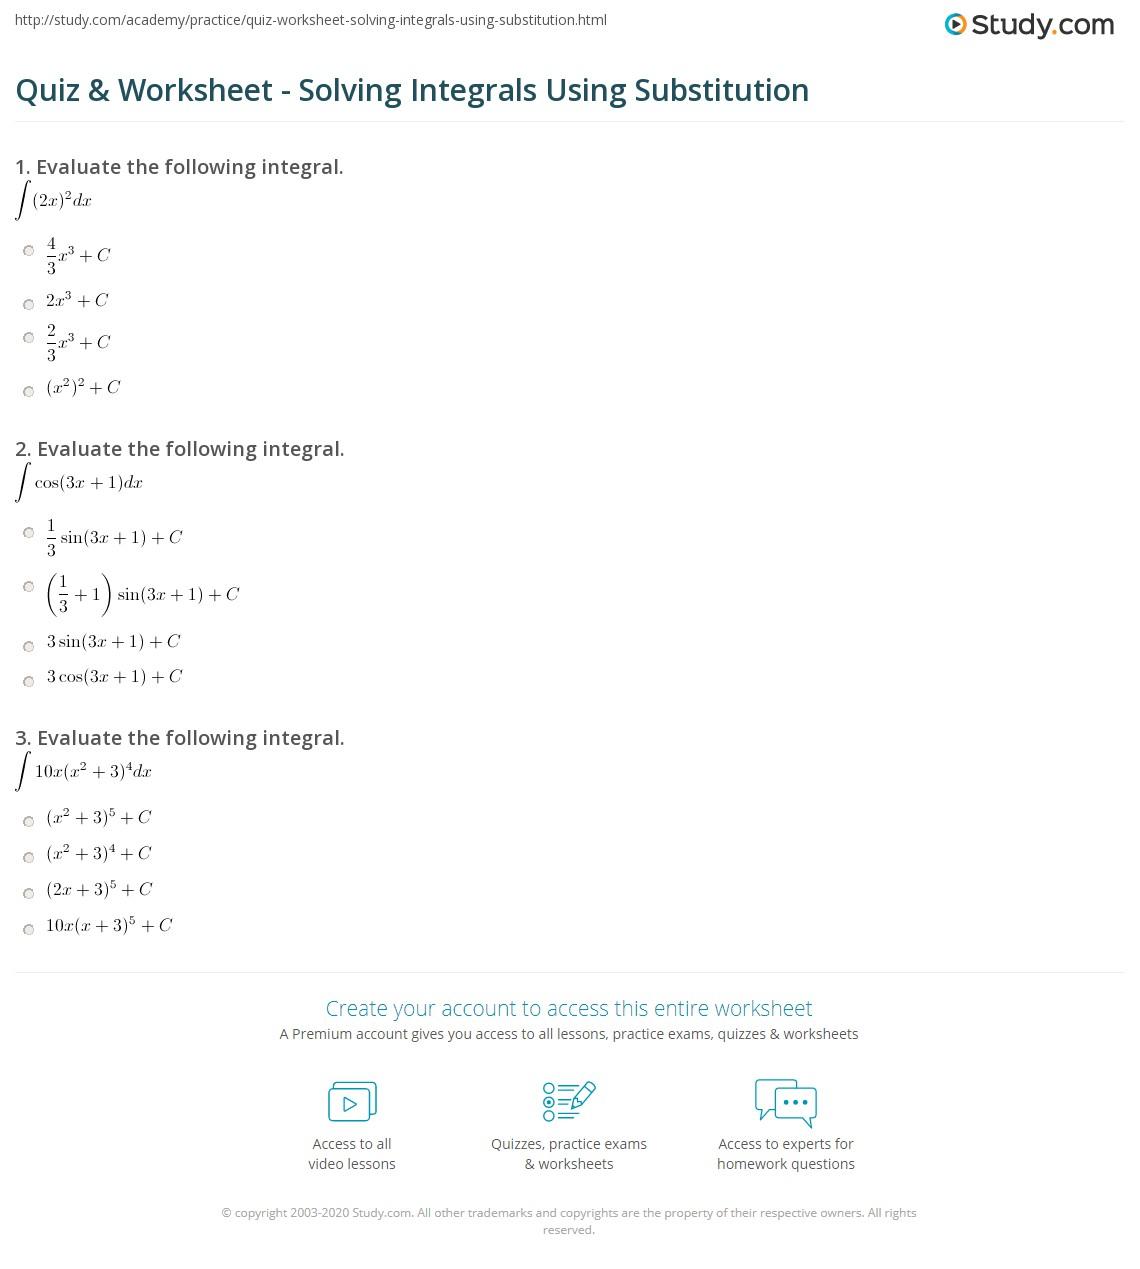 Quiz & Worksheet - Solving Integrals Using Substitution | Study.com